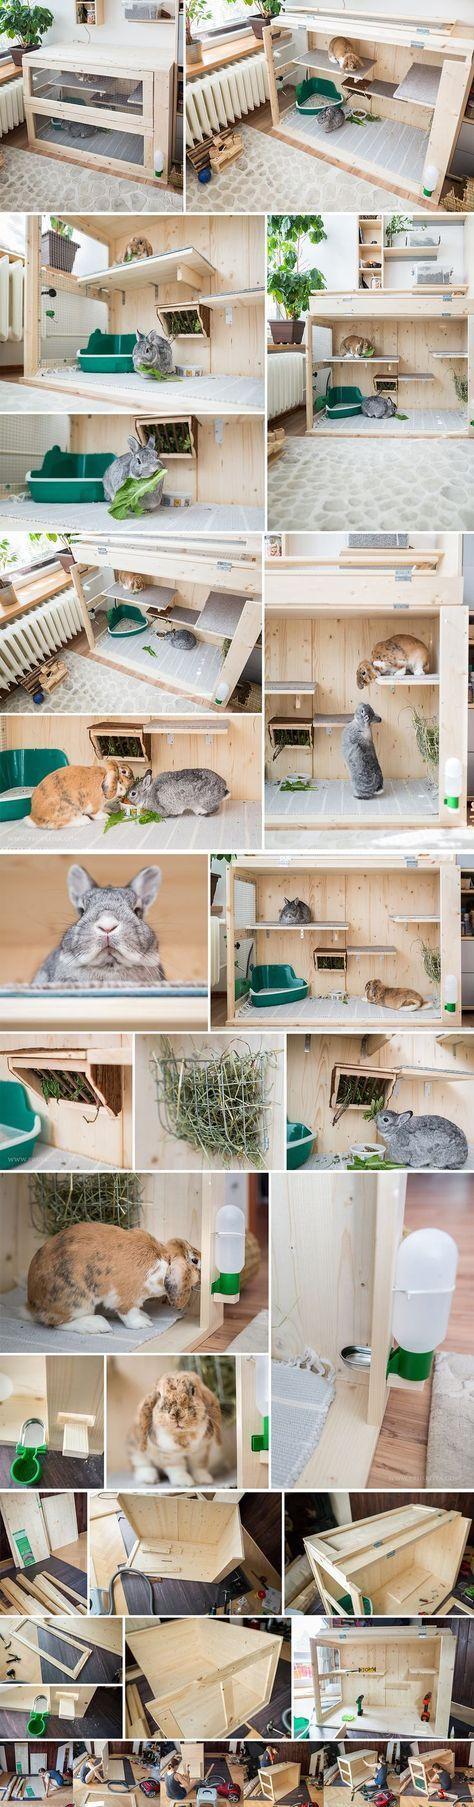 22e658c17407e812d190f957188a3730.jpg 736×2,806 pixels | Rabbit Care ...